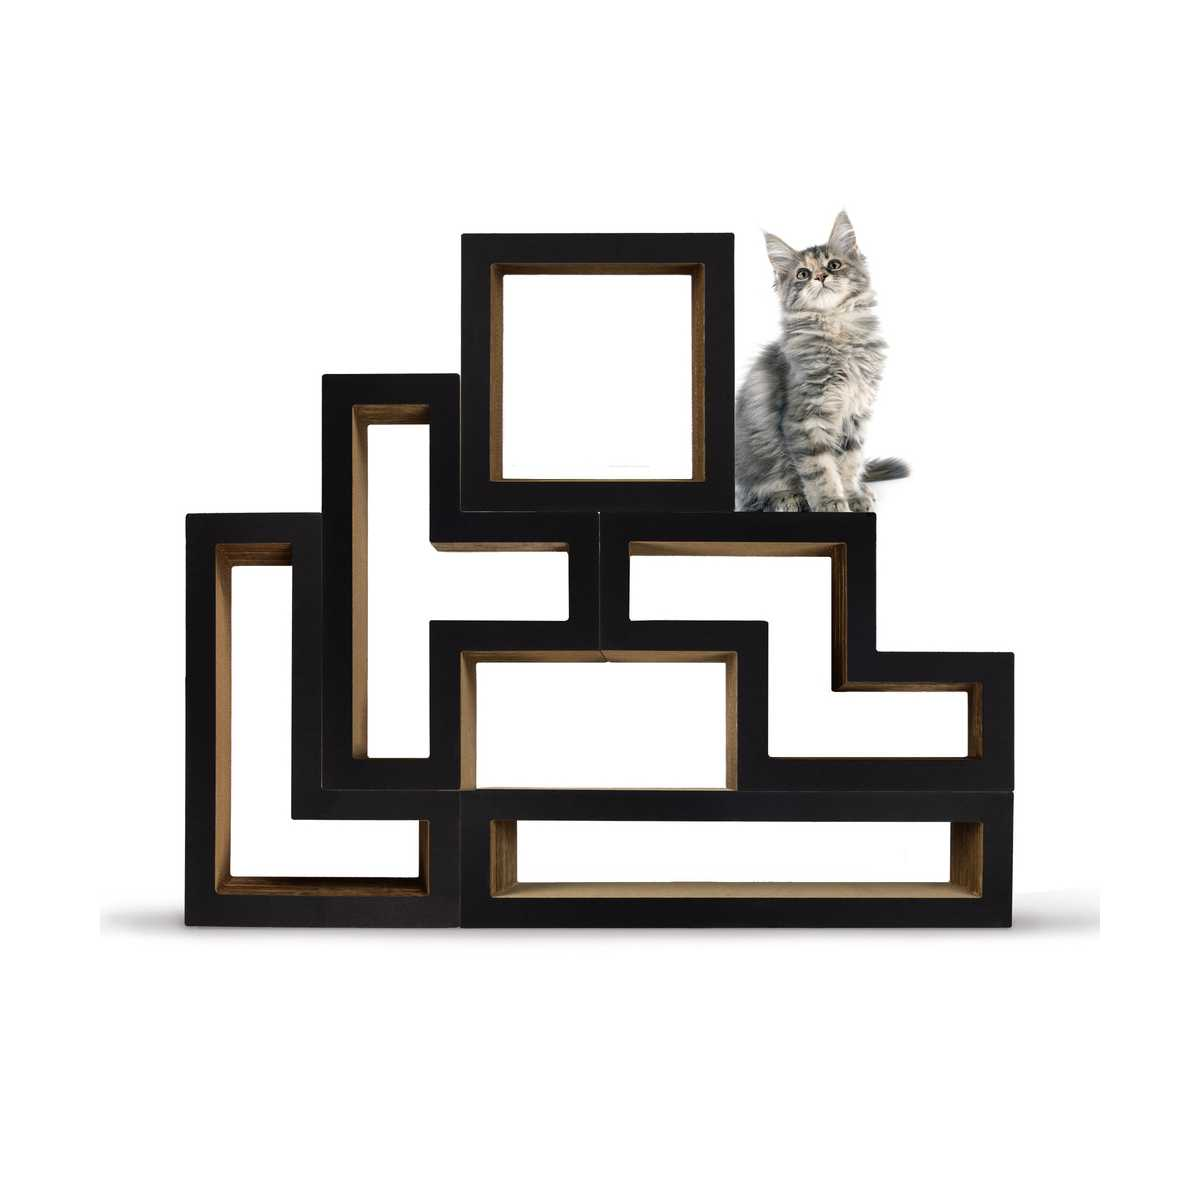 c1a9fb49015a Modular Cat Tree - Mono Black - CatsPlay Superstore